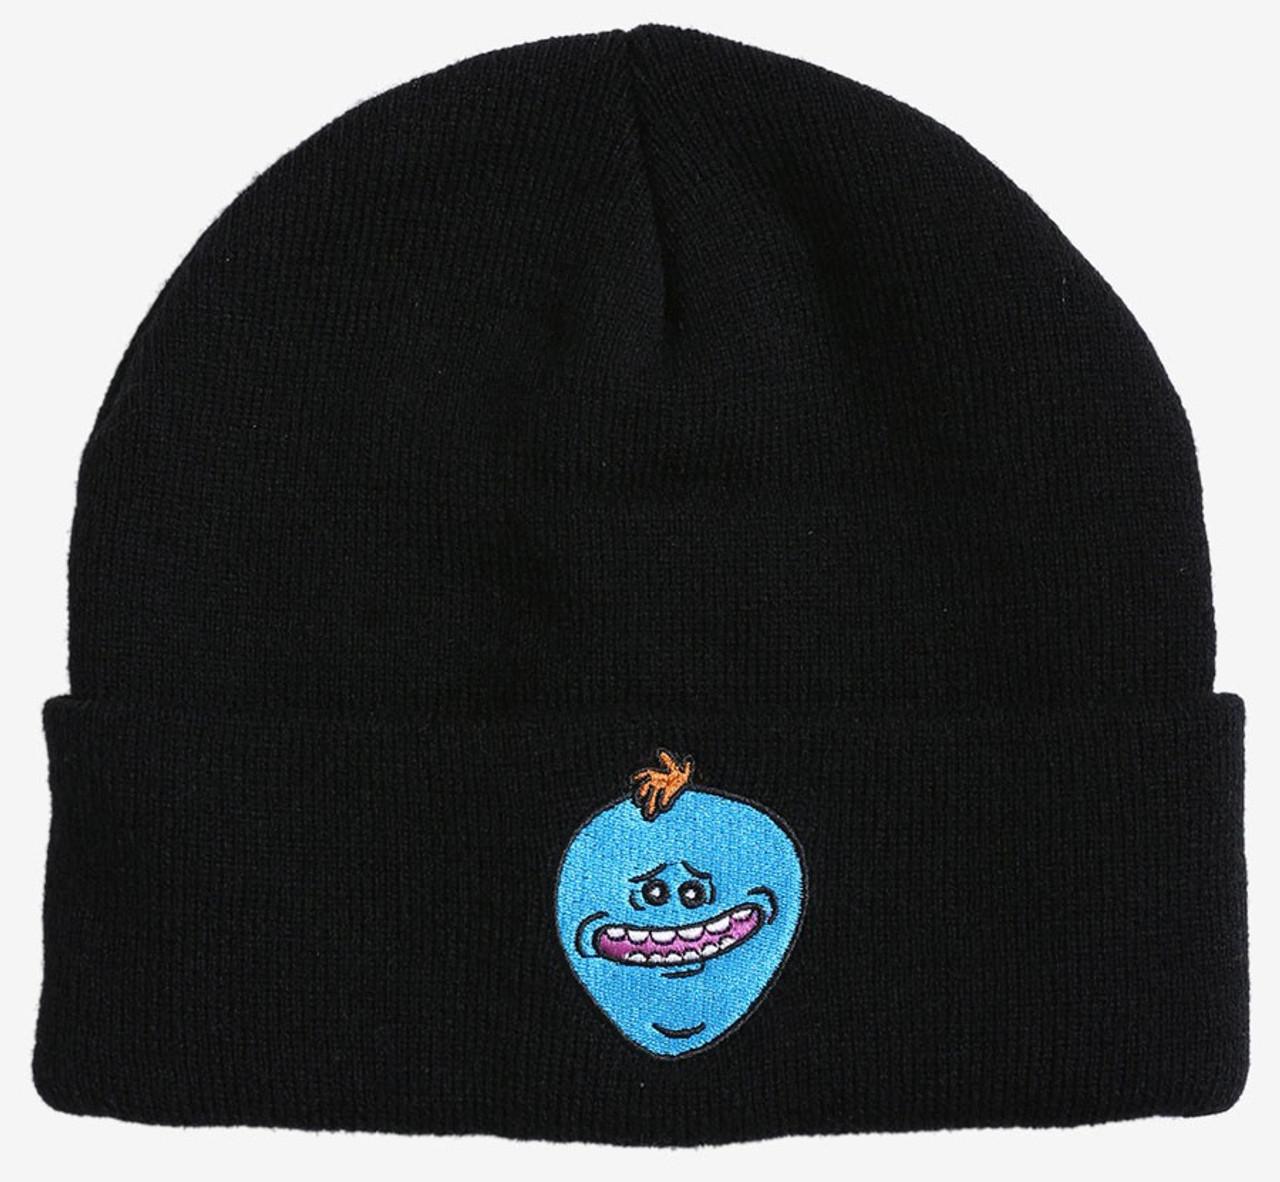 4809b09b0e6 Rick Morty Mr. Meeseeks Exclusive Beanie Hat Bioworld - ToyWiz